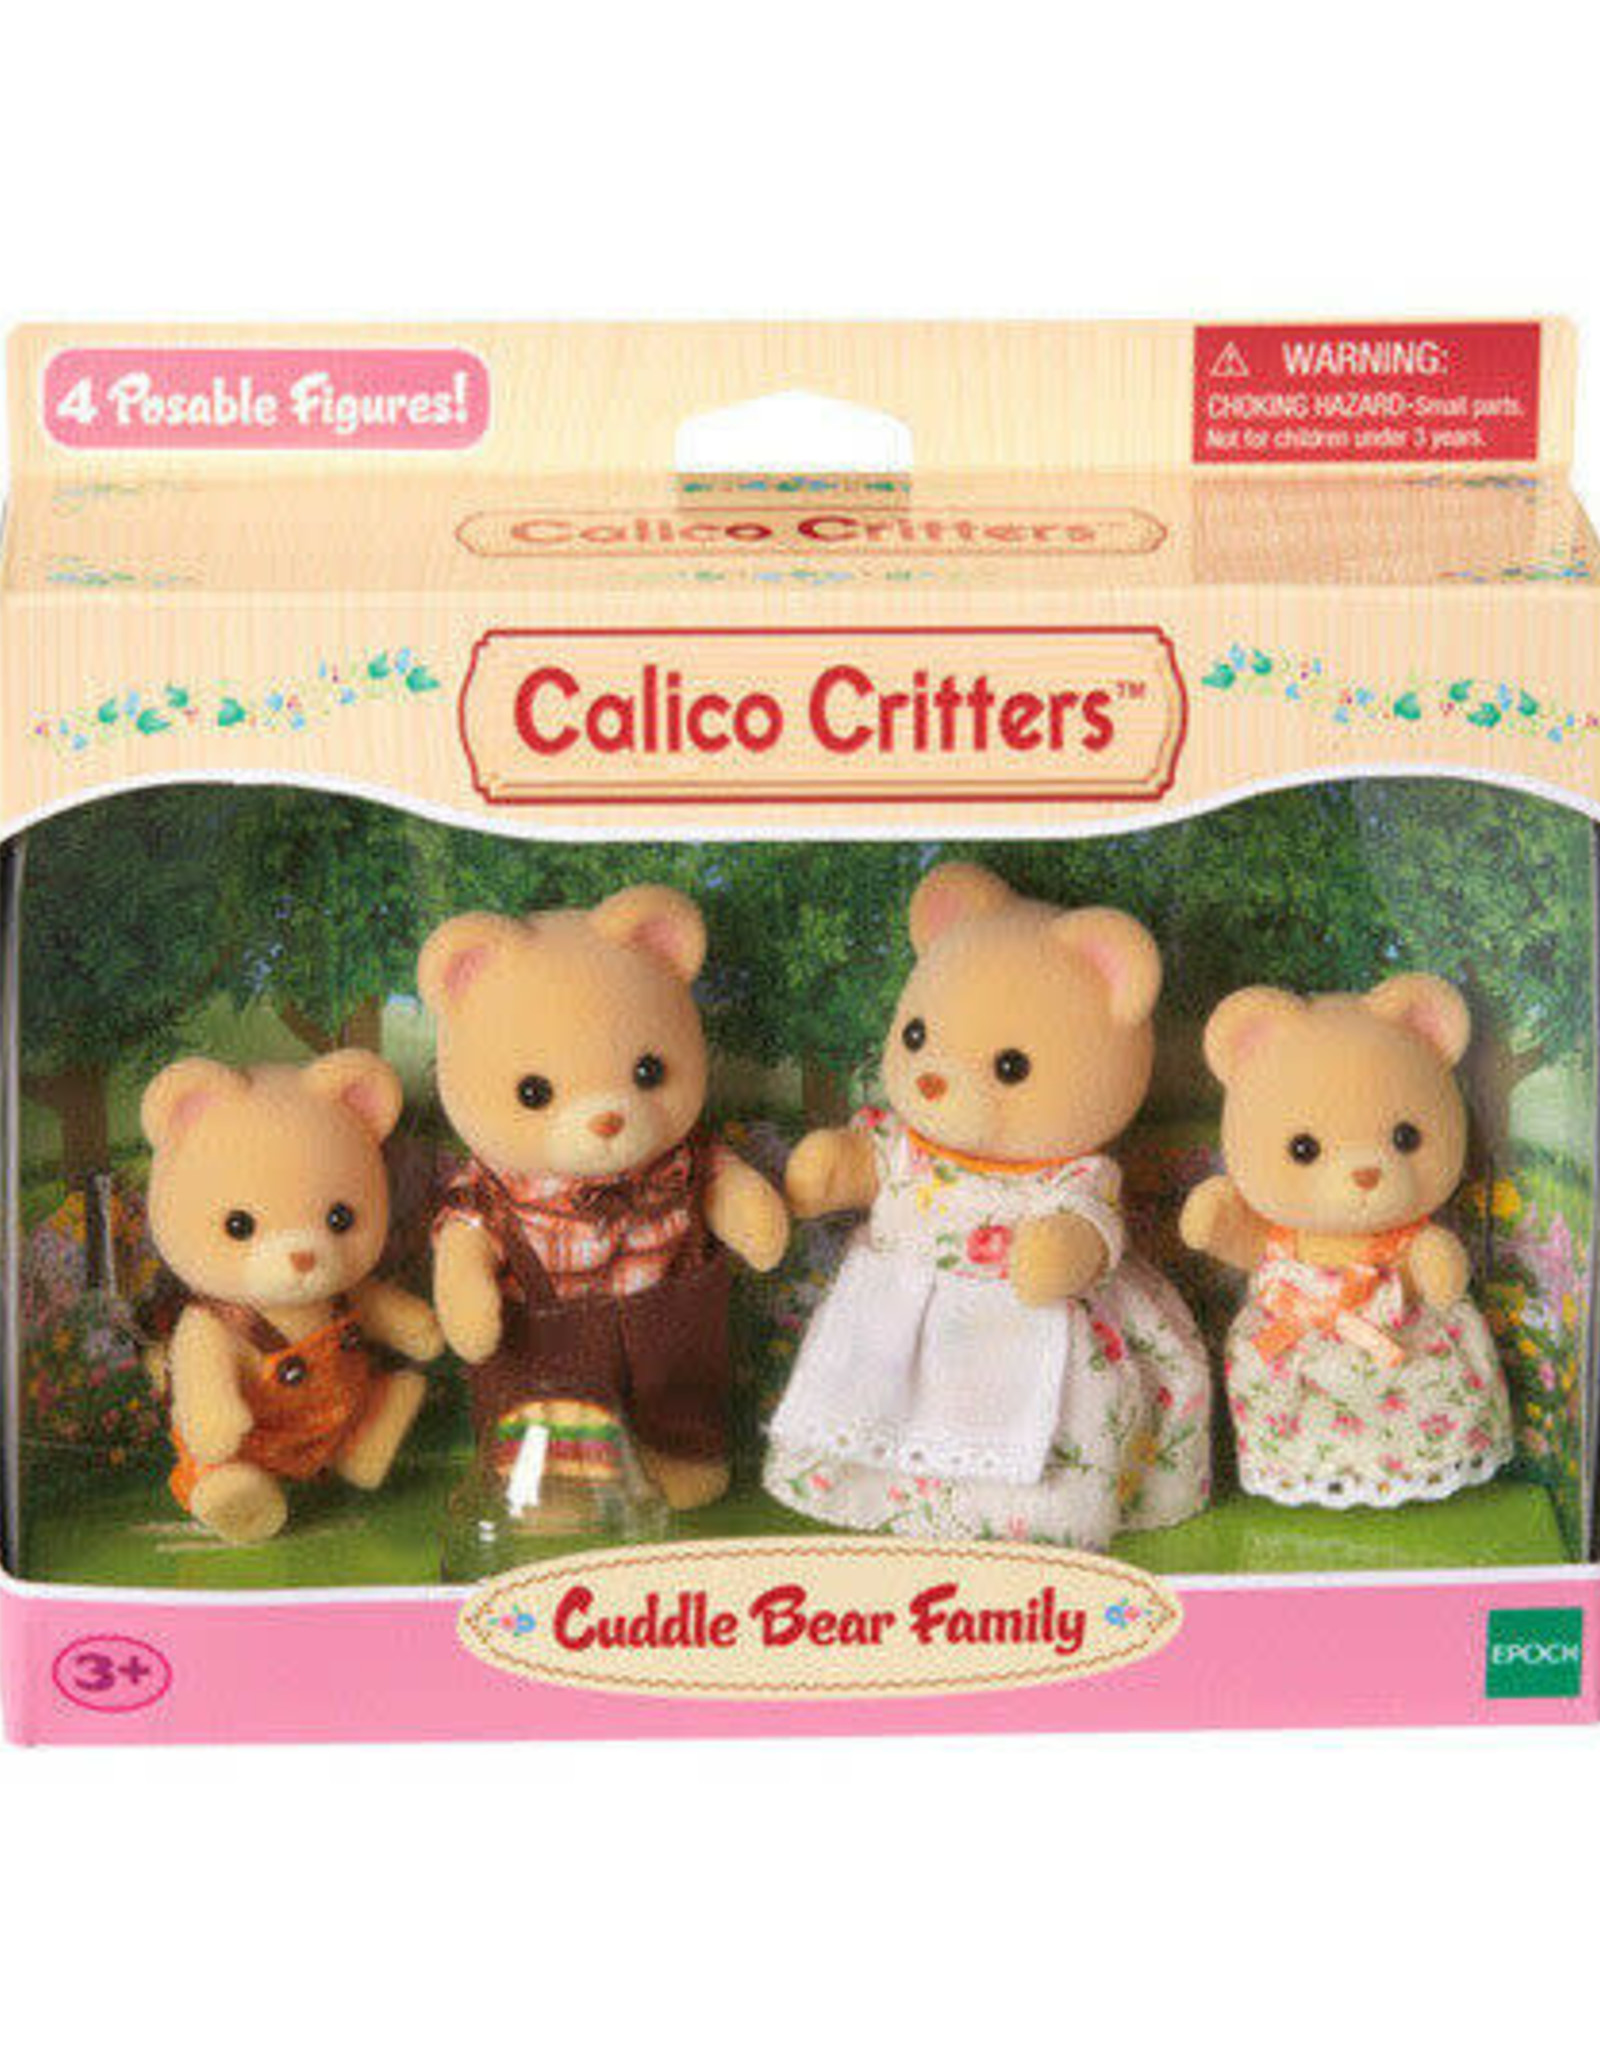 Epoch International Calico Critter Cuddle Bear Family